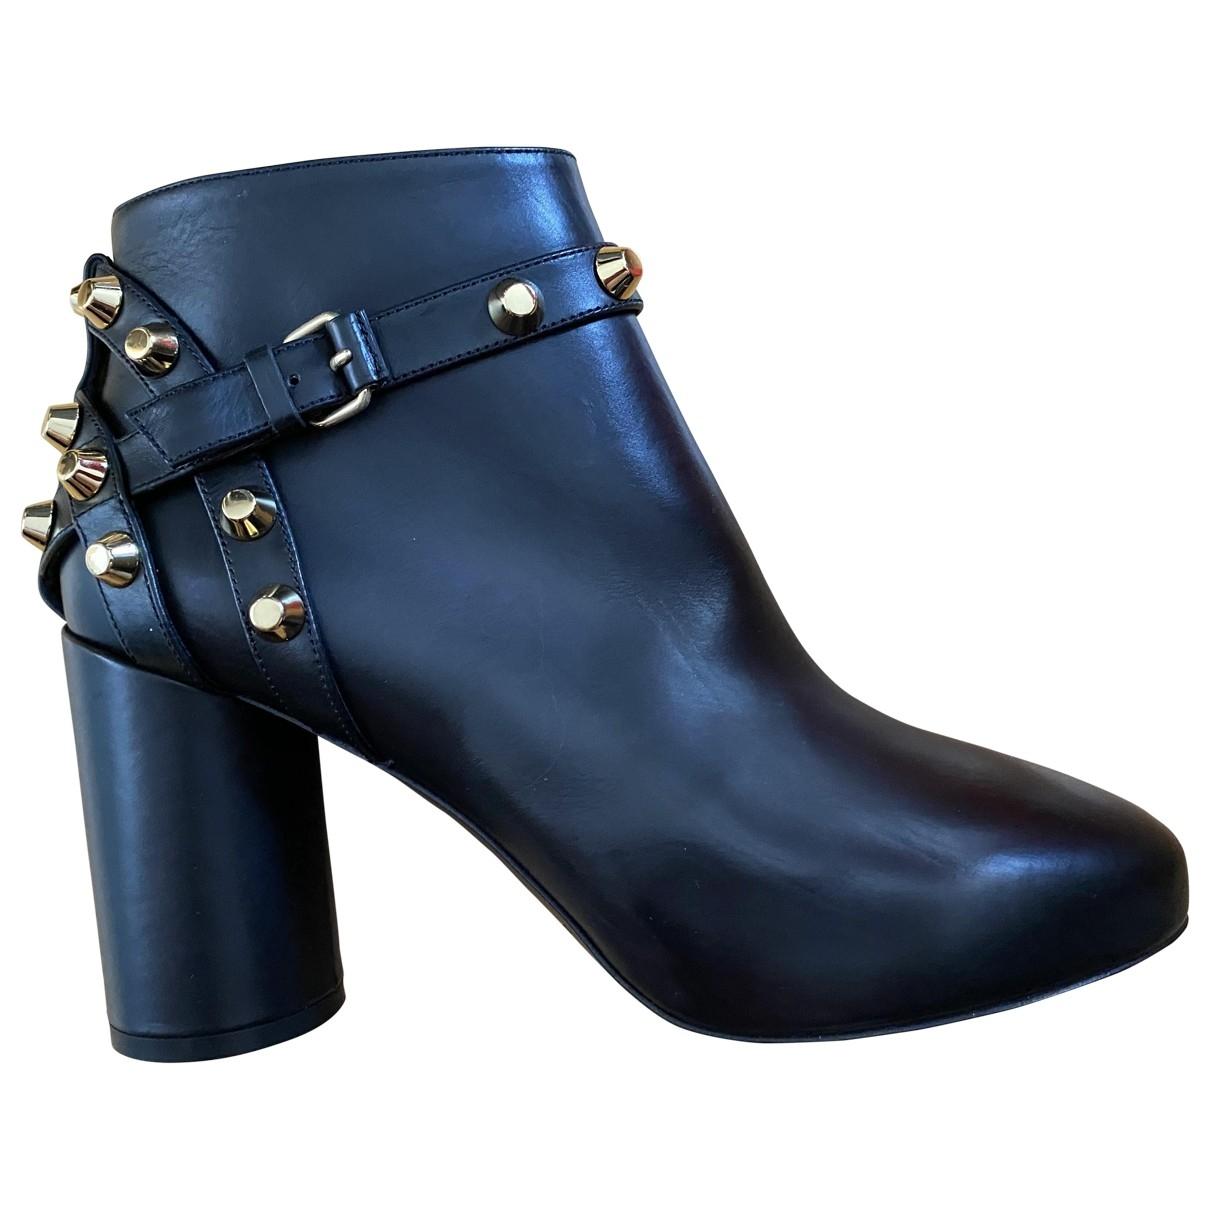 Balenciaga \N Black Leather Ankle boots for Women 36 EU